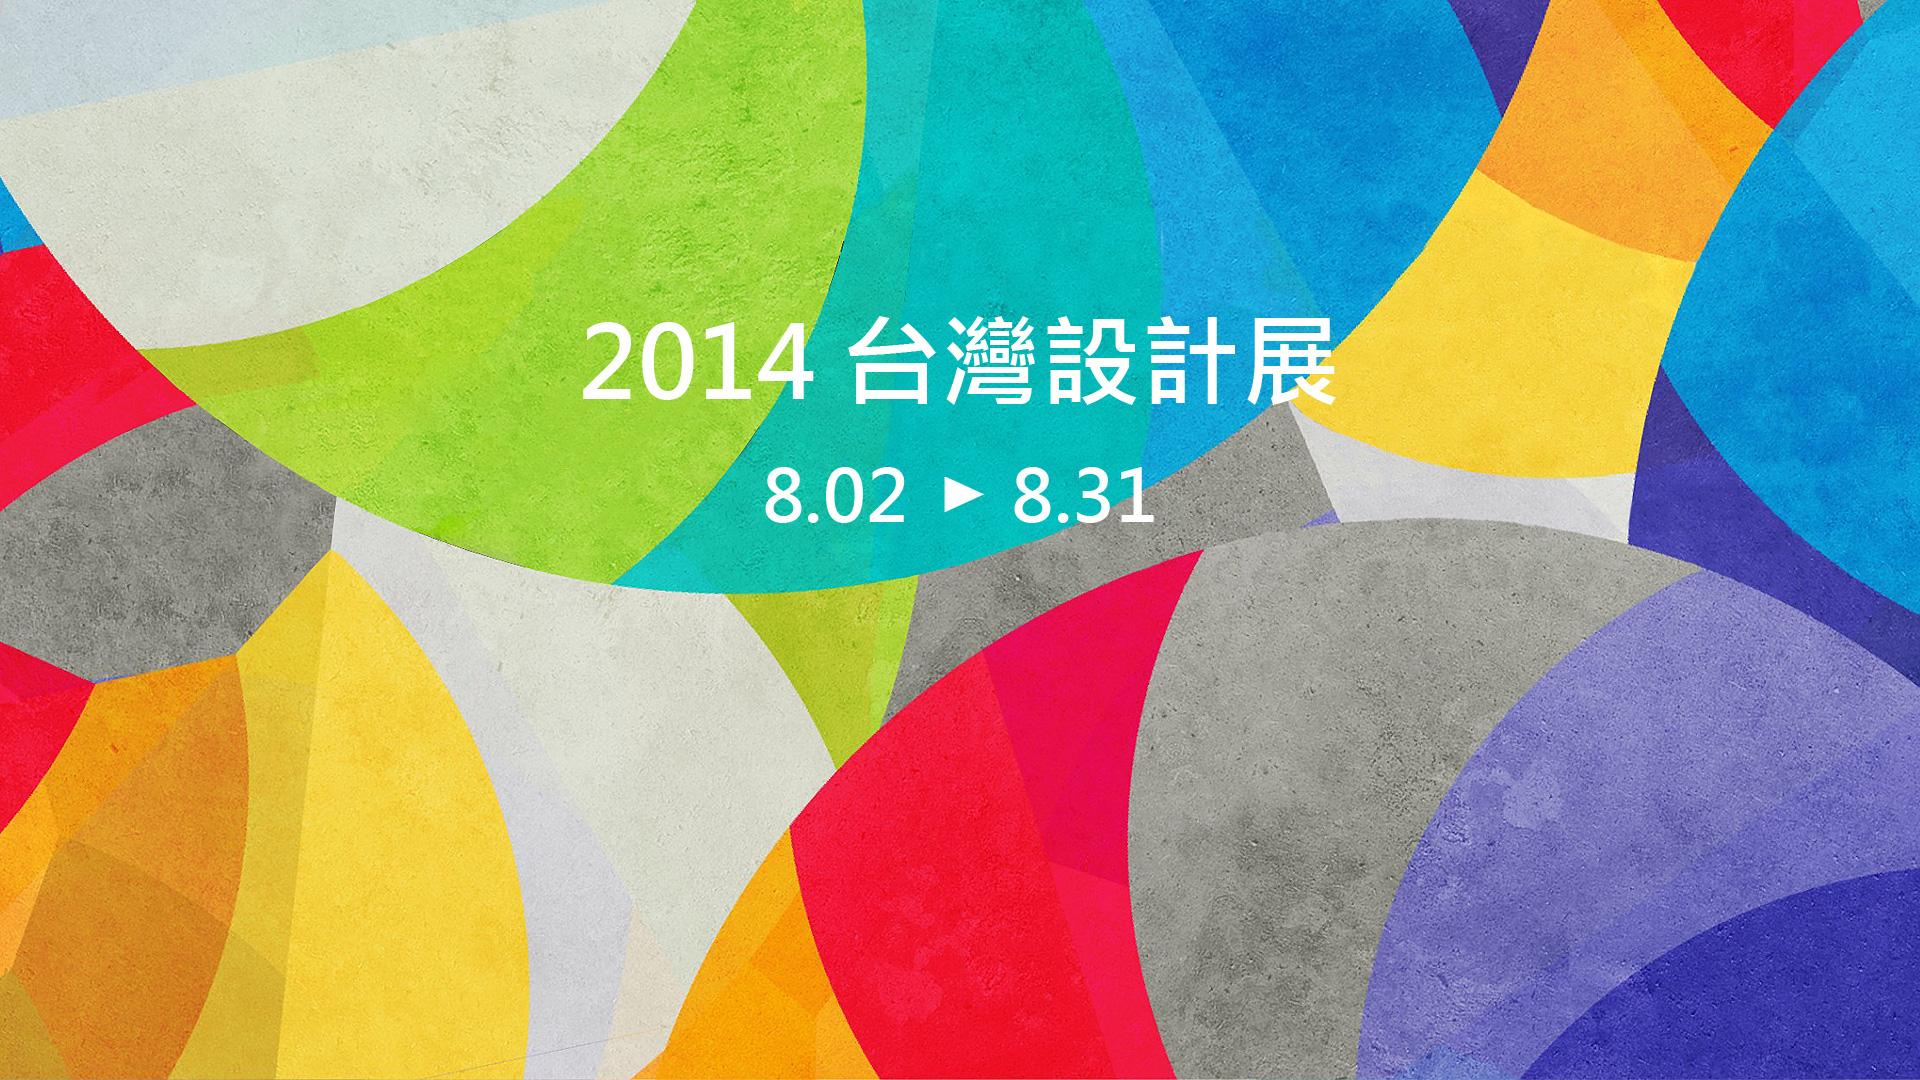 Taiwan Design Expo 2015 Taiwan Design Expo